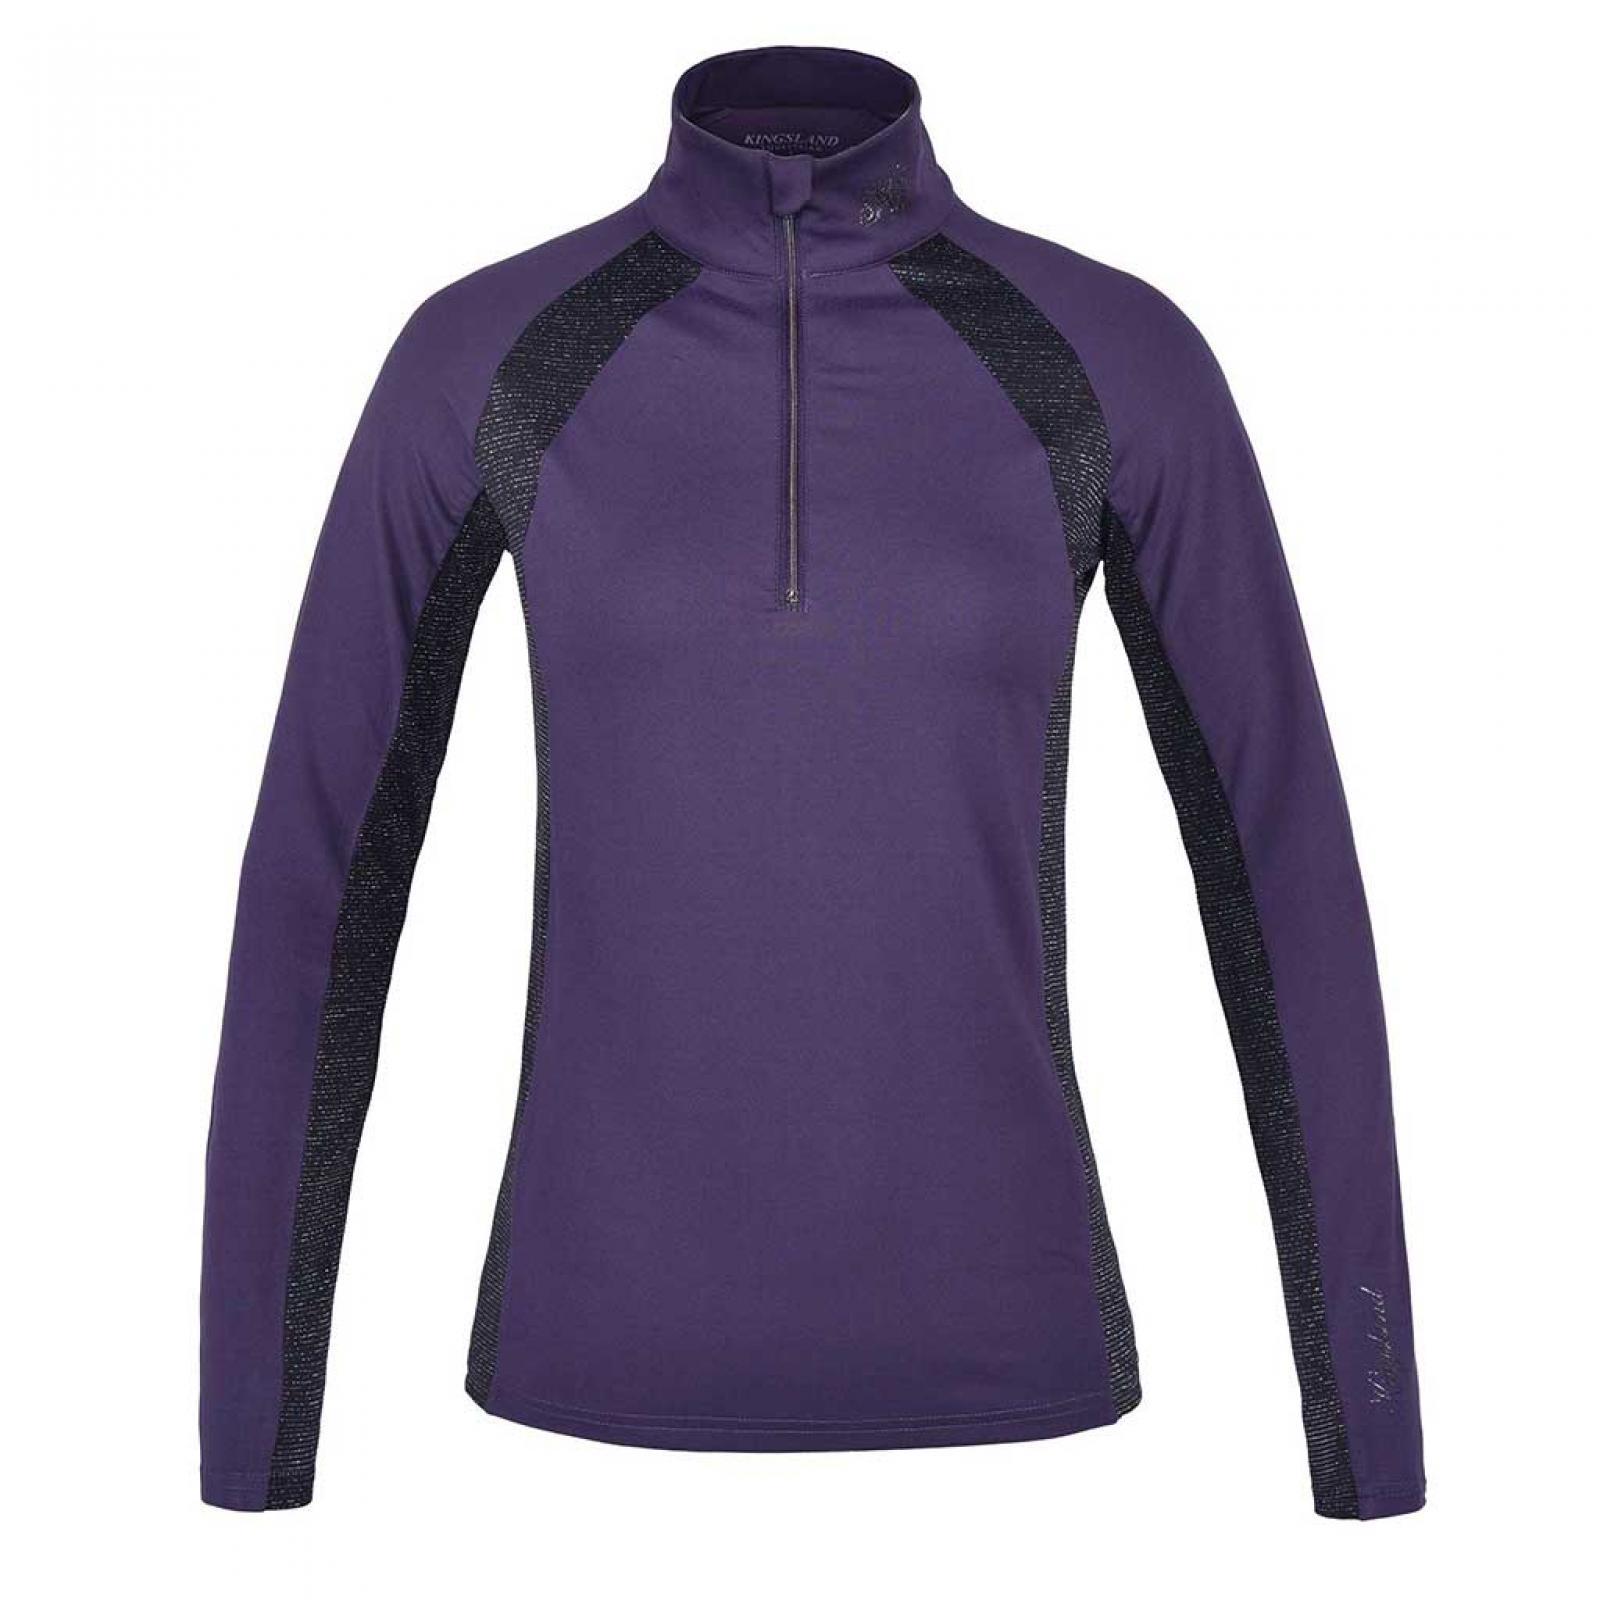 (KL)ダニエラ レディース ZIPトレーニングシャツ